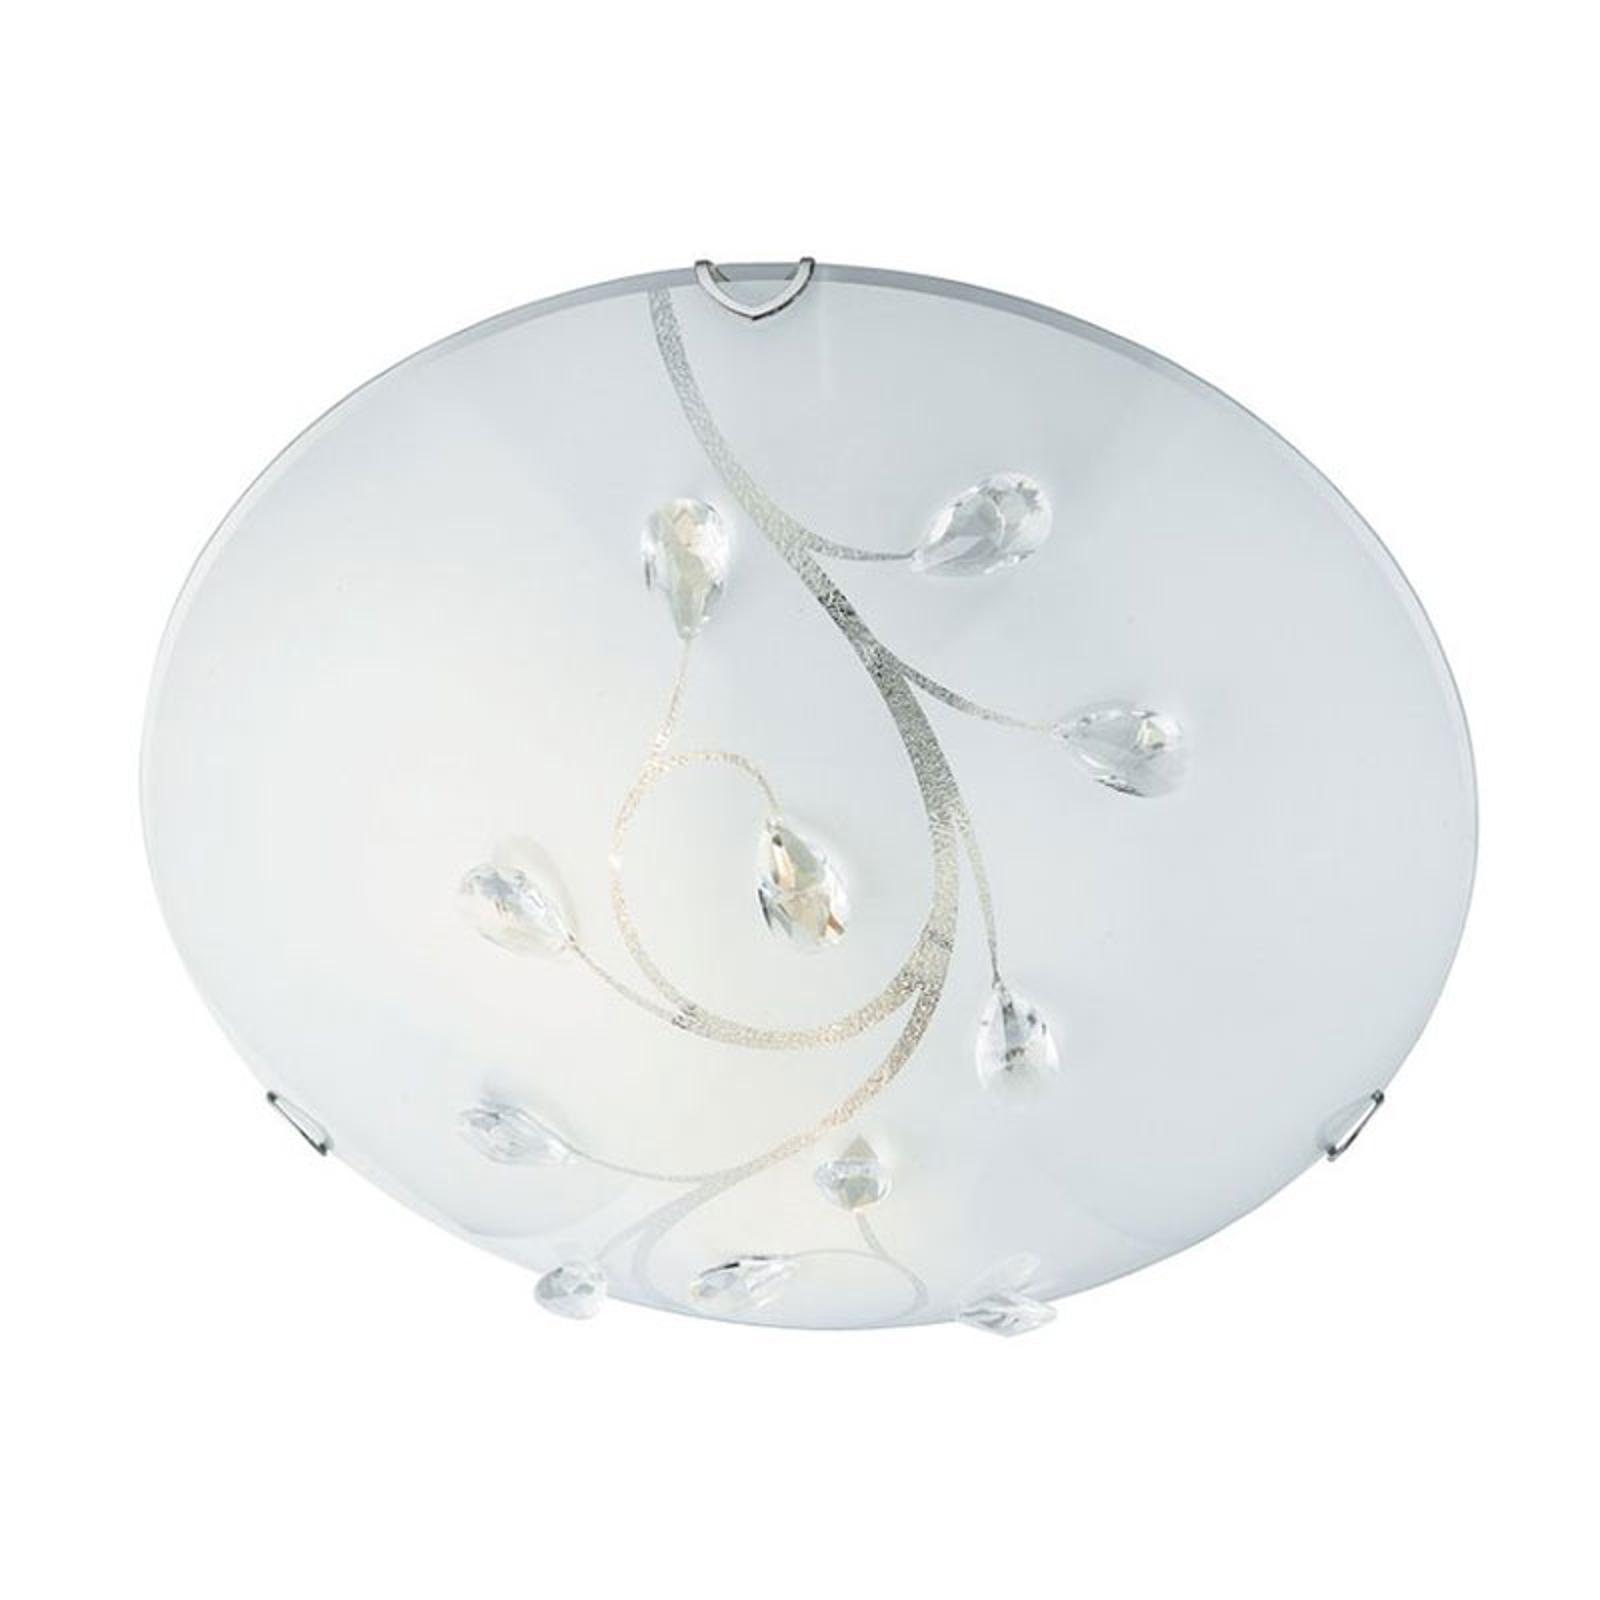 Szklana lampa sufitowa Flush Flower, Ø 40cm